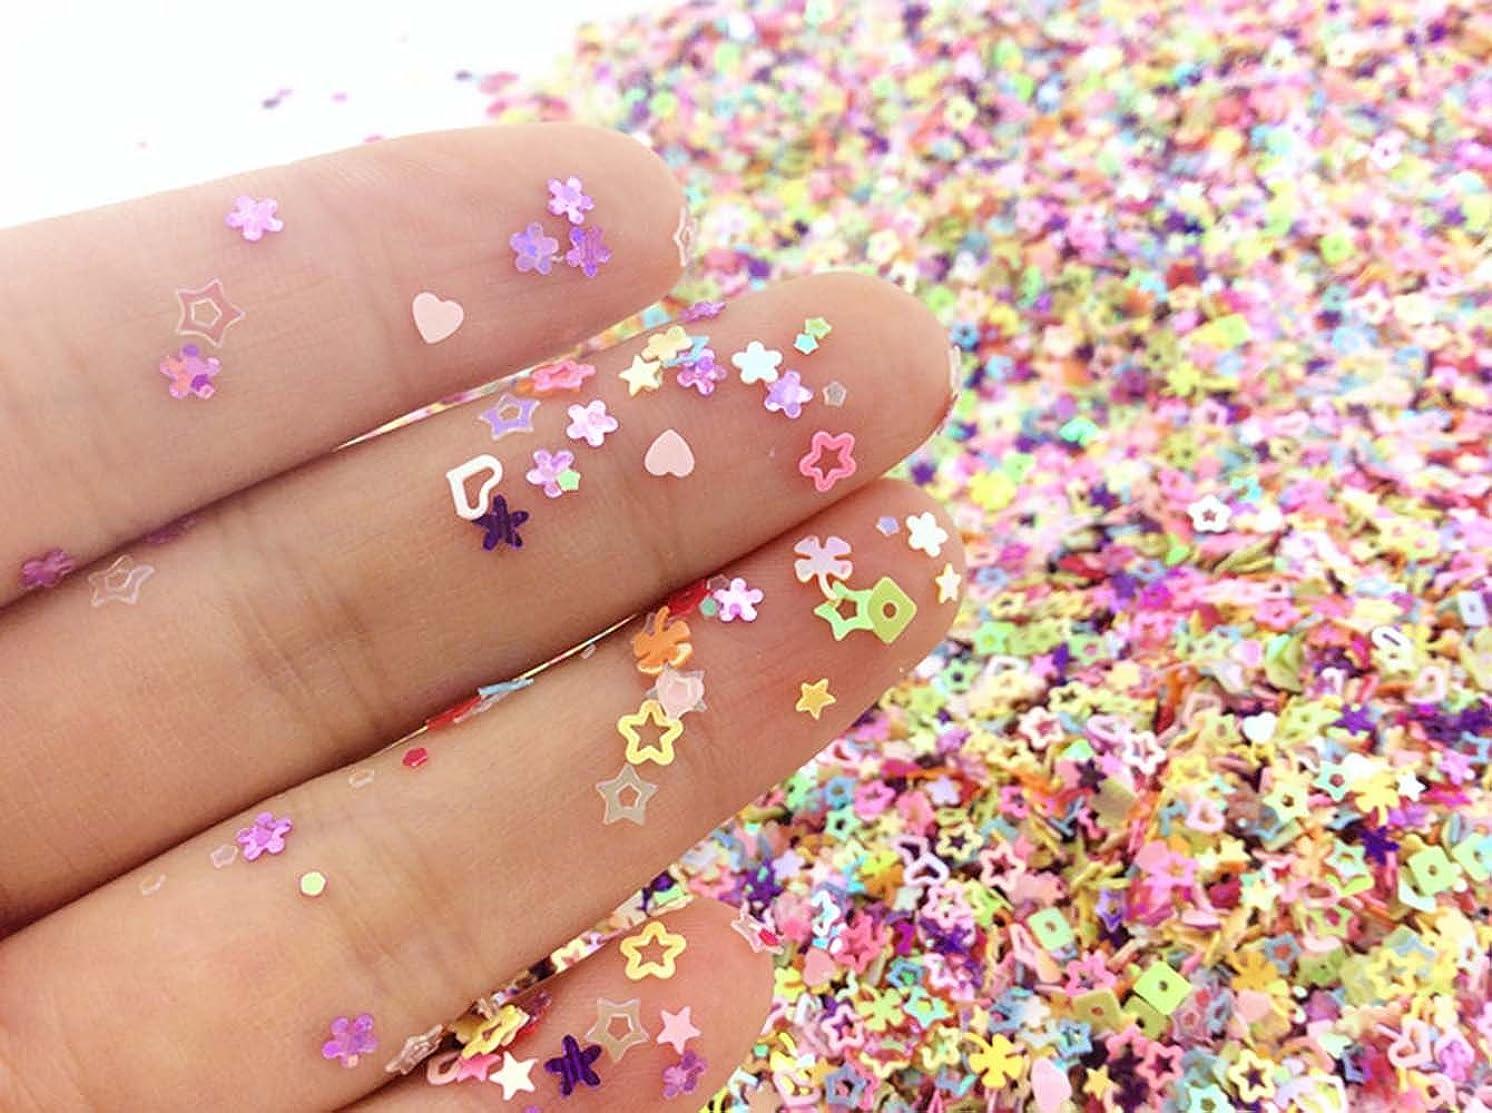 TKOnline 3.6oz/100g Multicolor Manicure Glitter Confetti,Mixed Shapes Size 2-4mm For Party Decoration,DIY Crafts,Premium Nail Art Etc